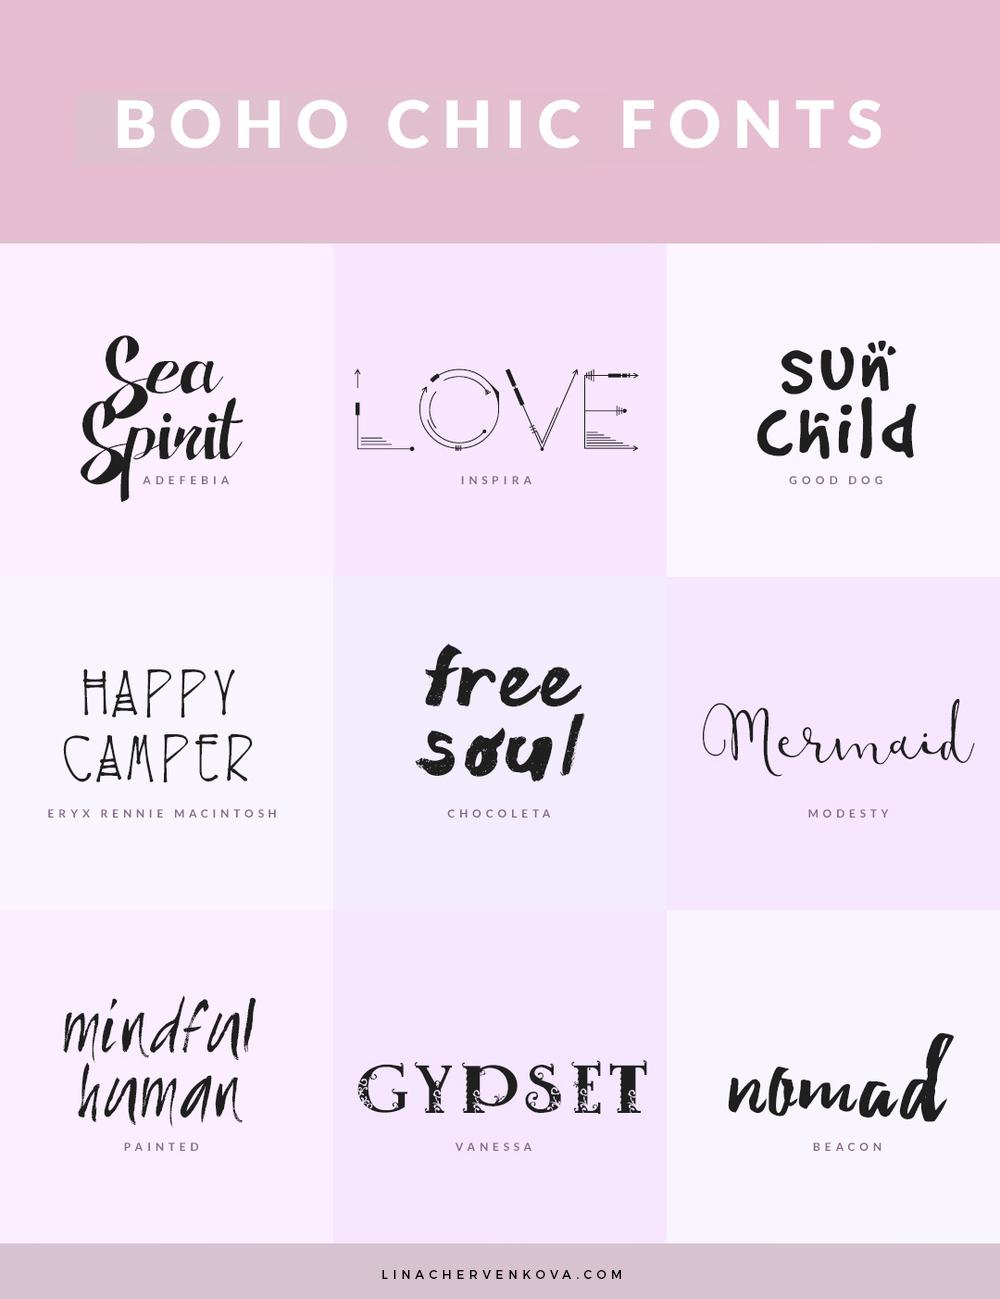 9 Free Boho Chic Fonts   linachervenkova.com